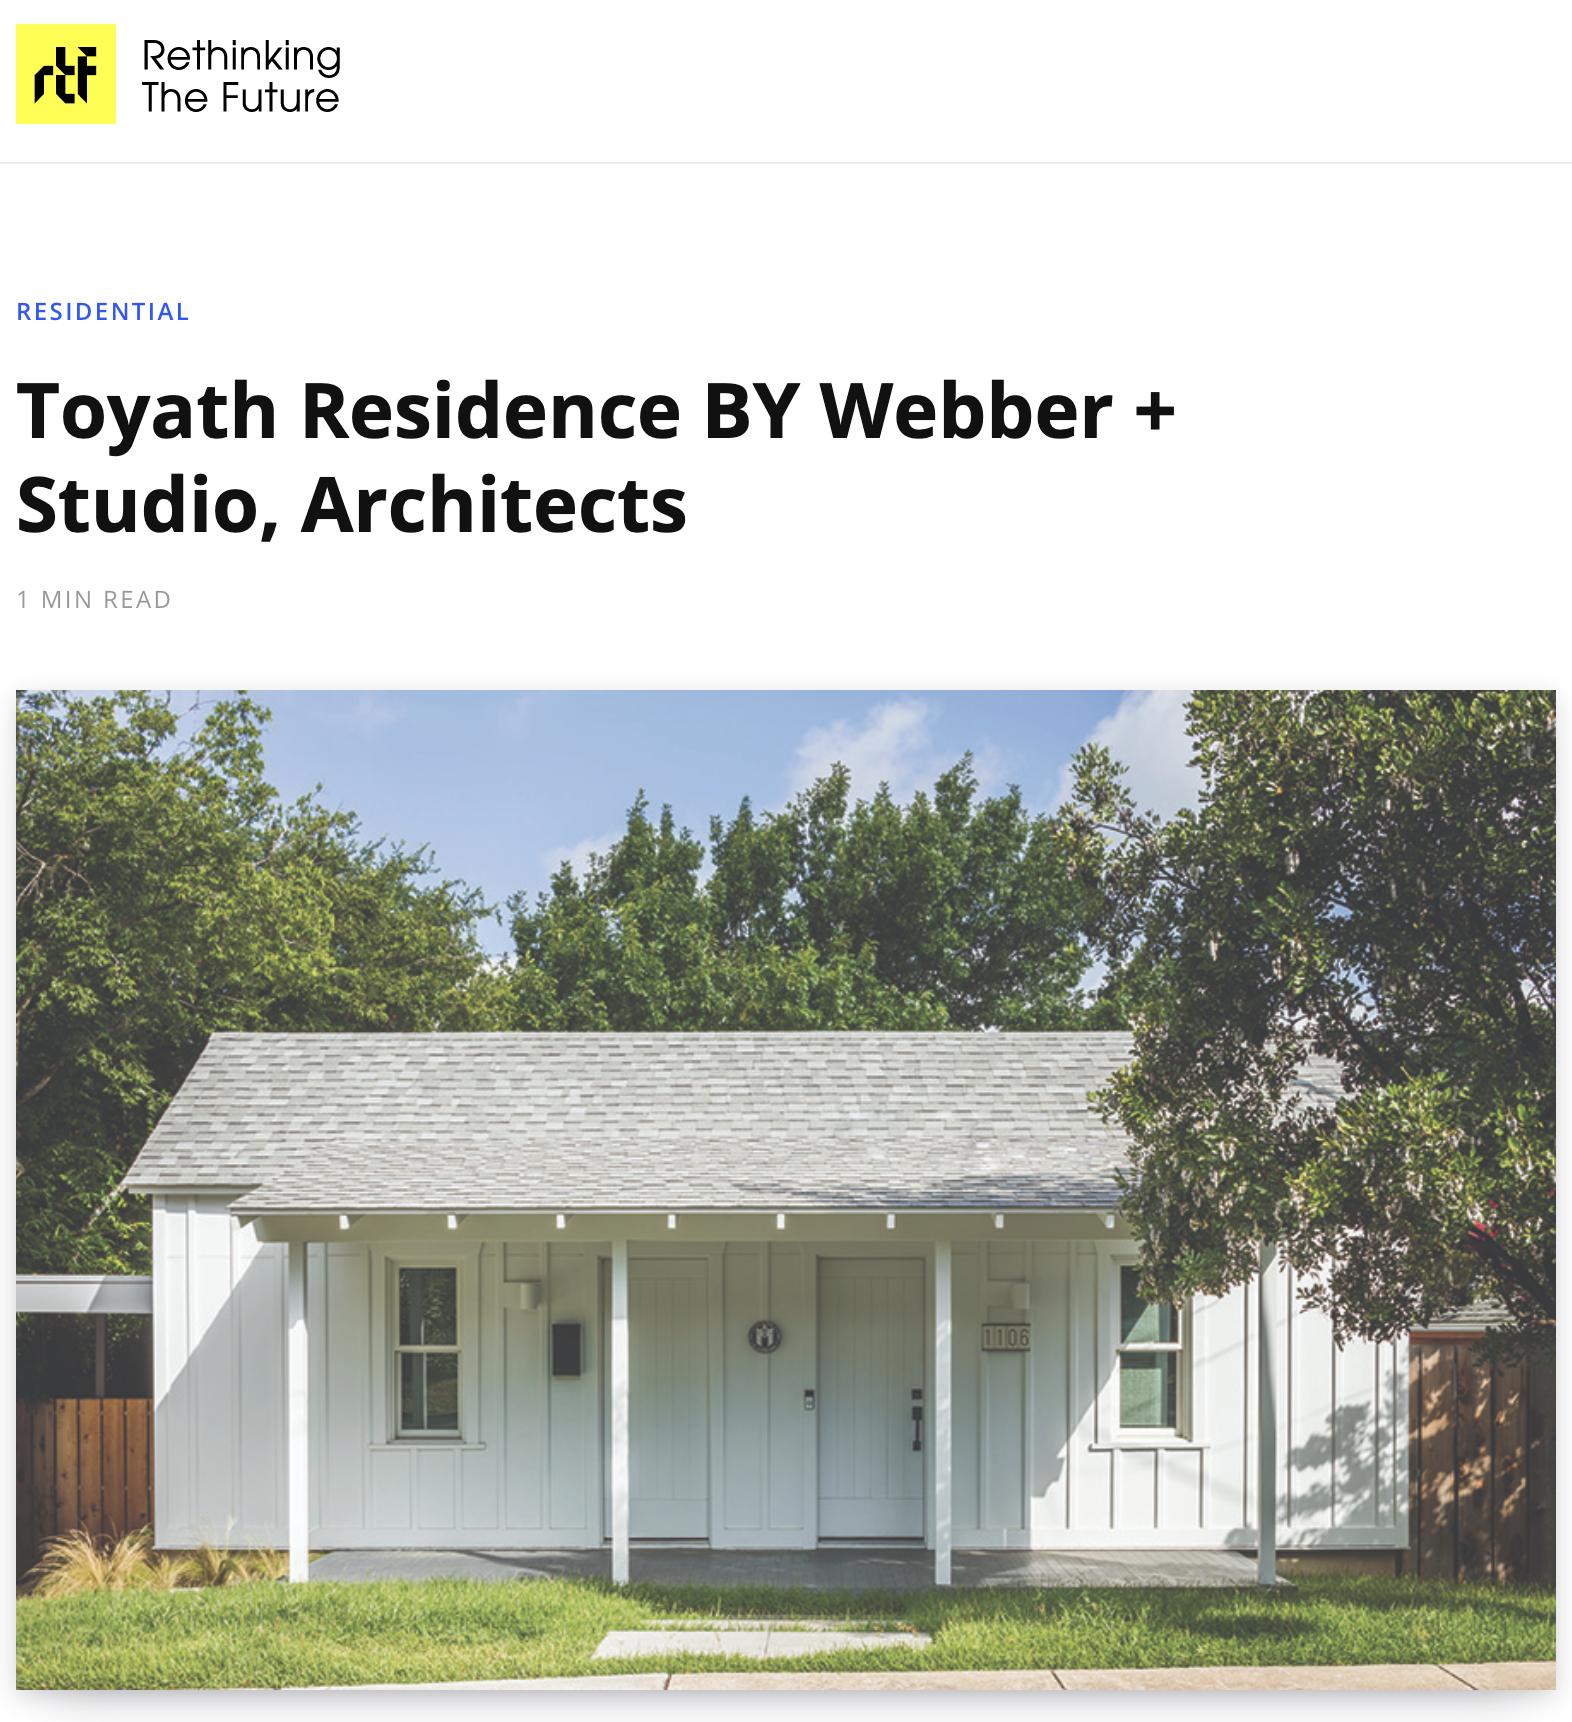 Toyath Residence by Webber + Studios